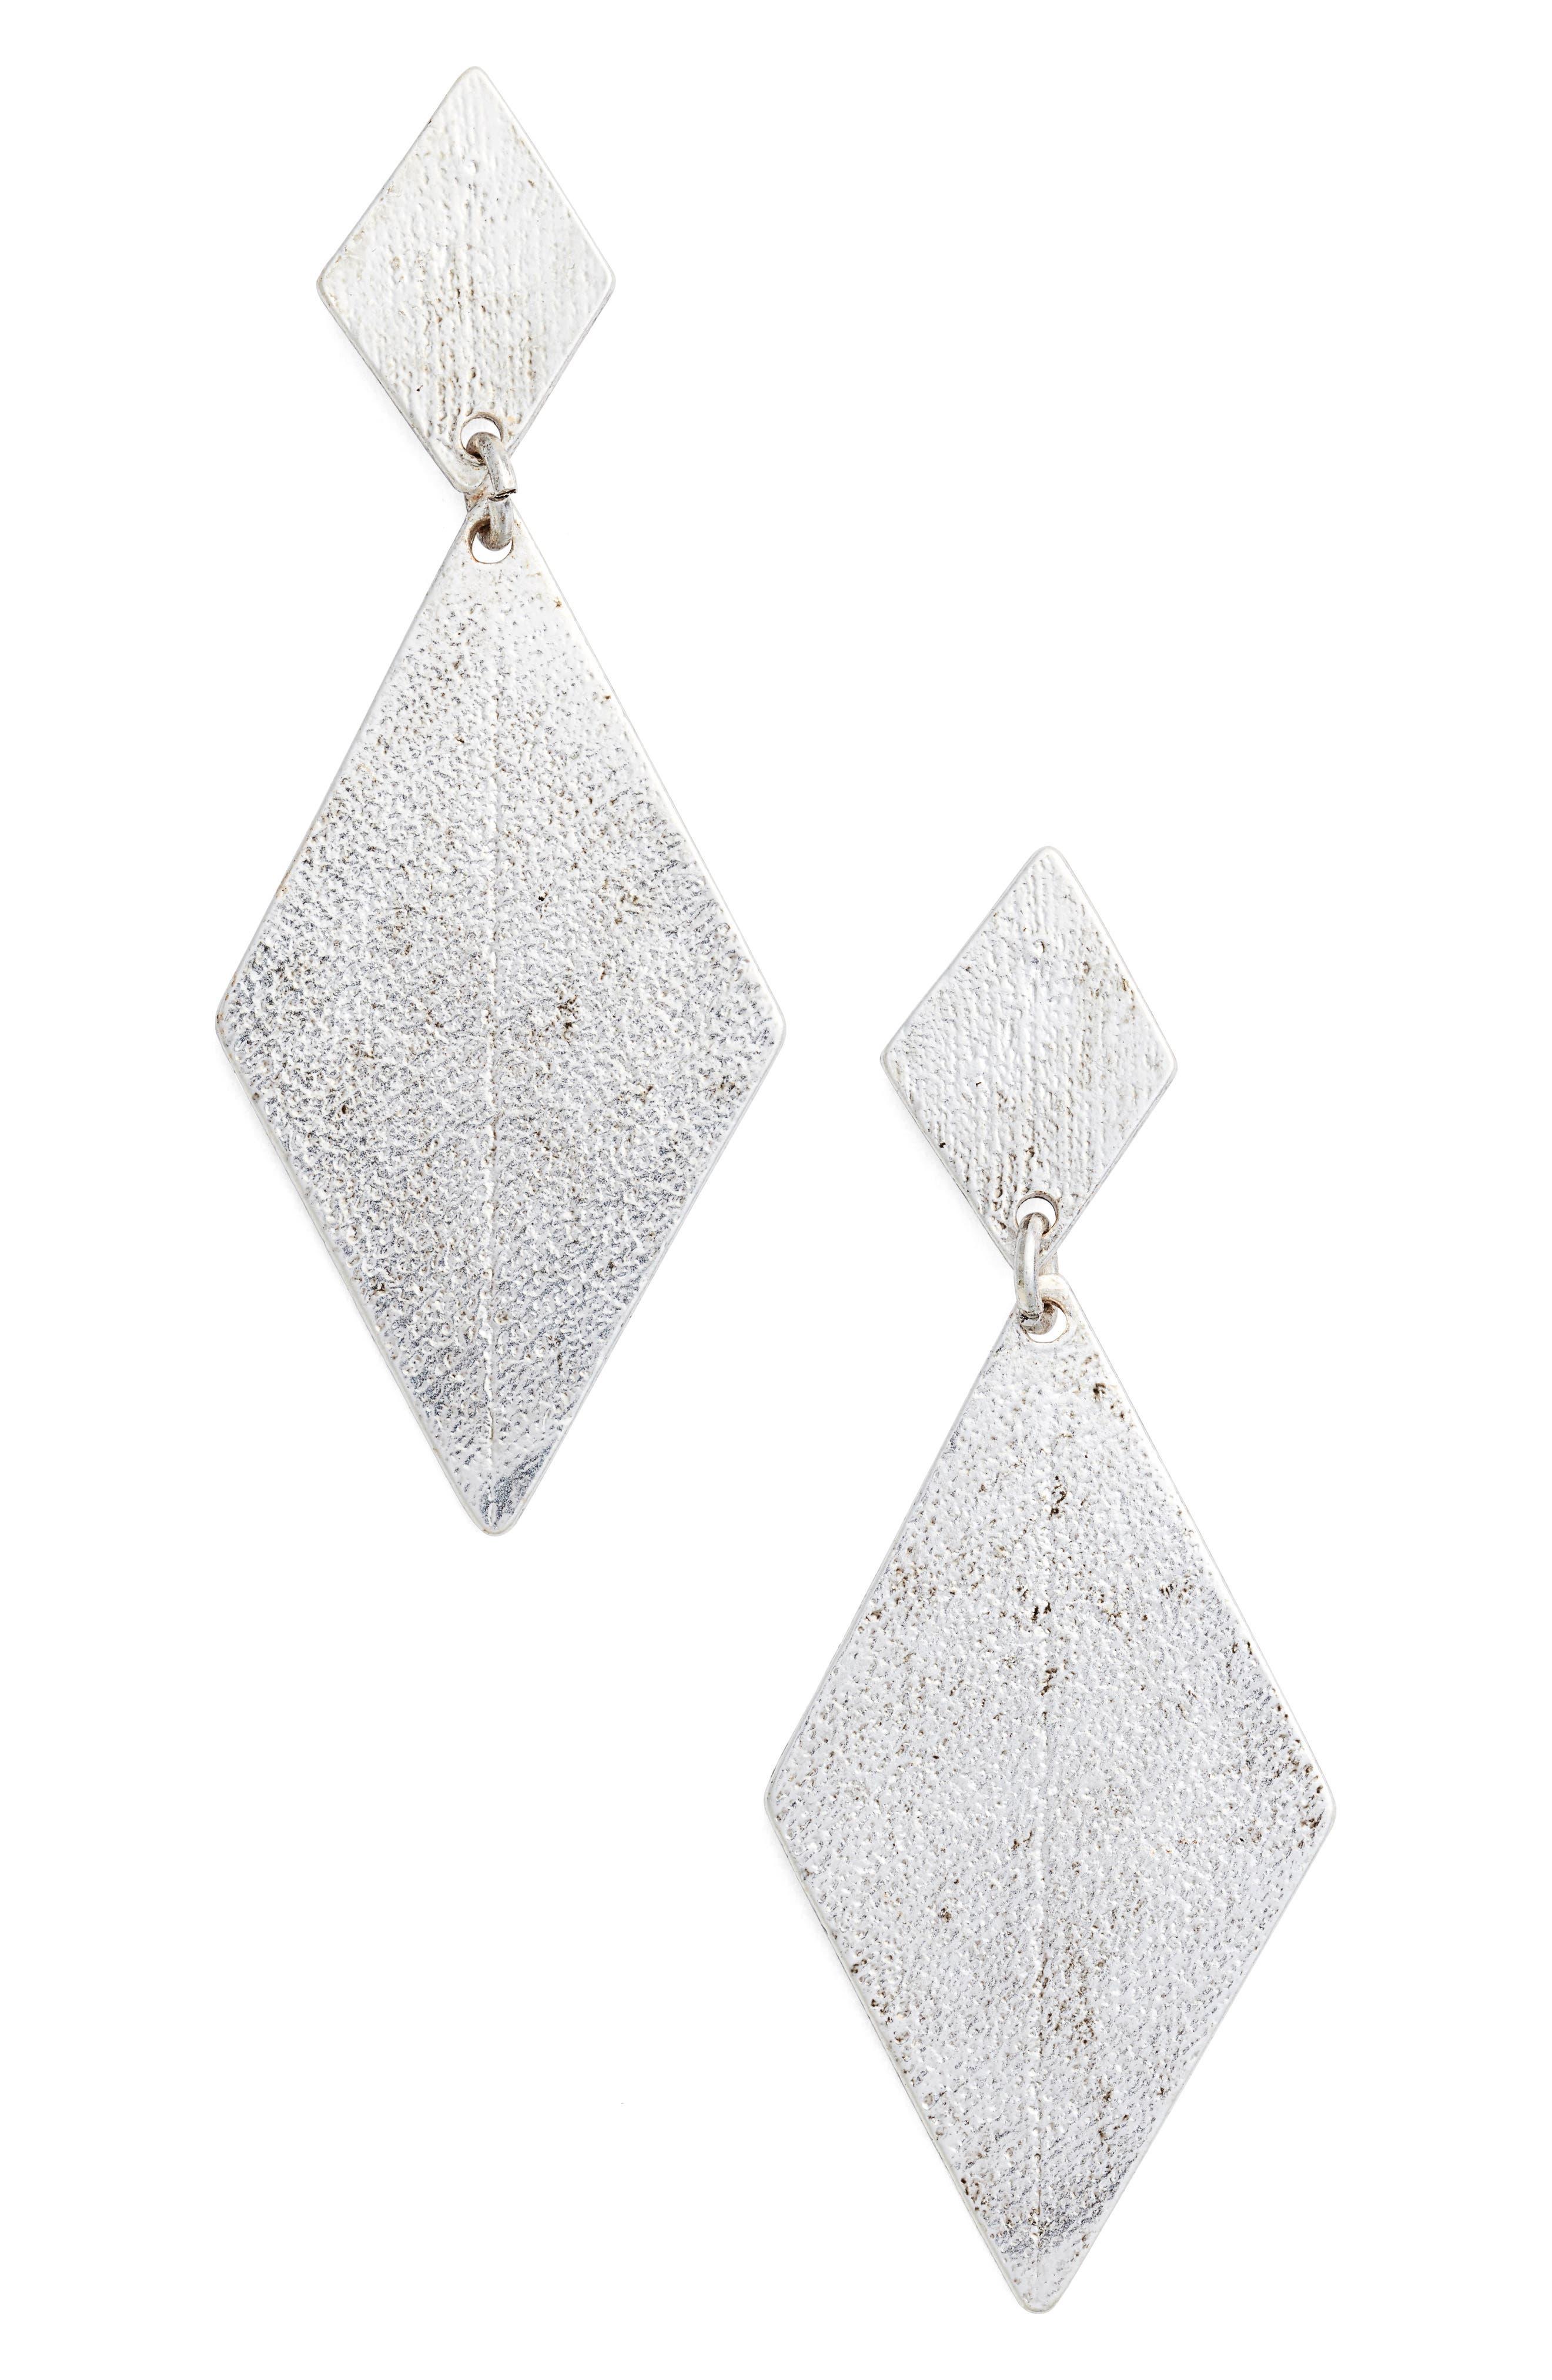 Kite Earrings,                         Main,                         color, Silver